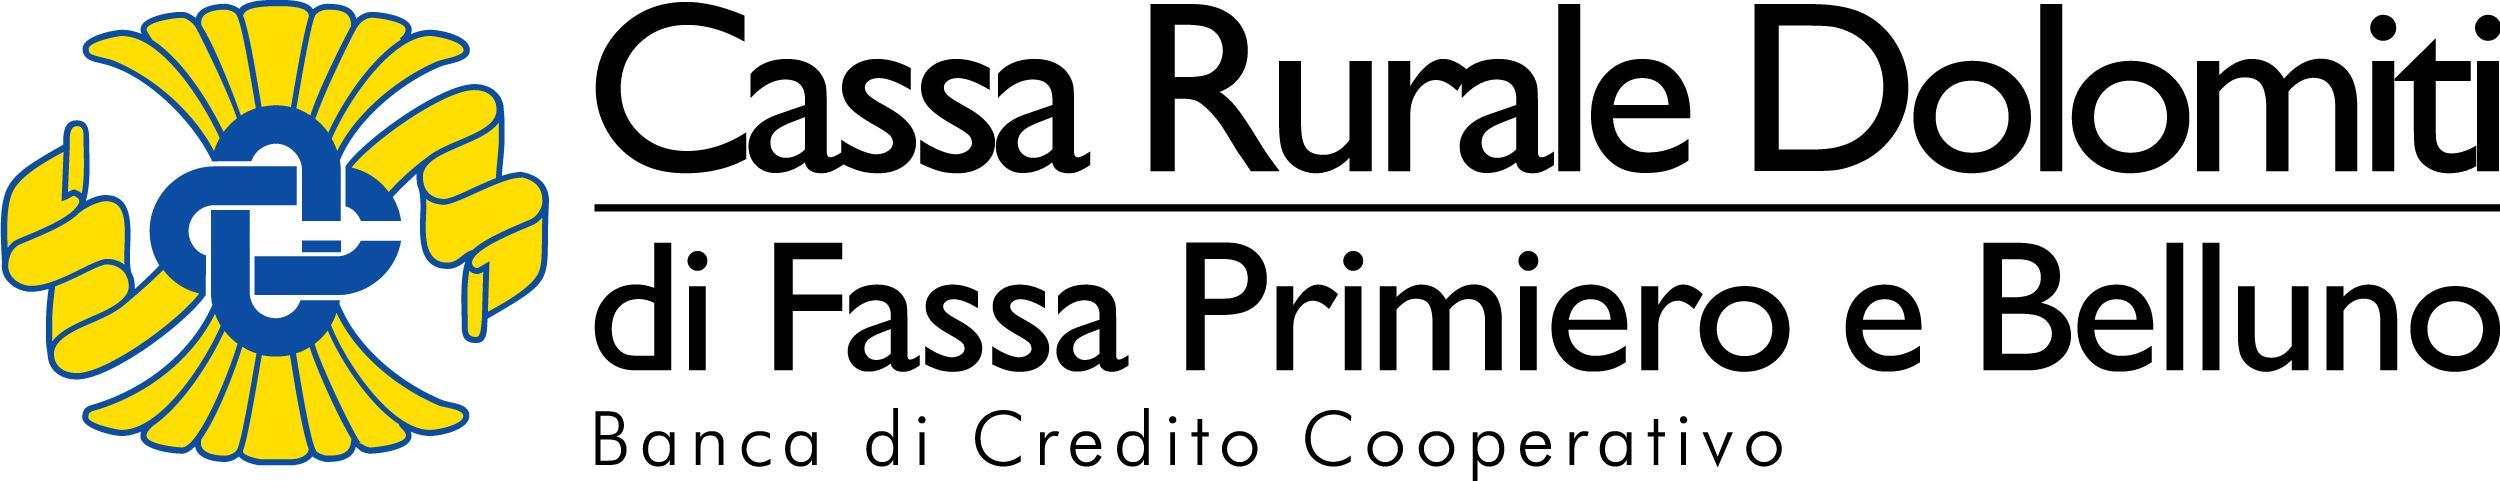 Cassa Rurale Dolomiti